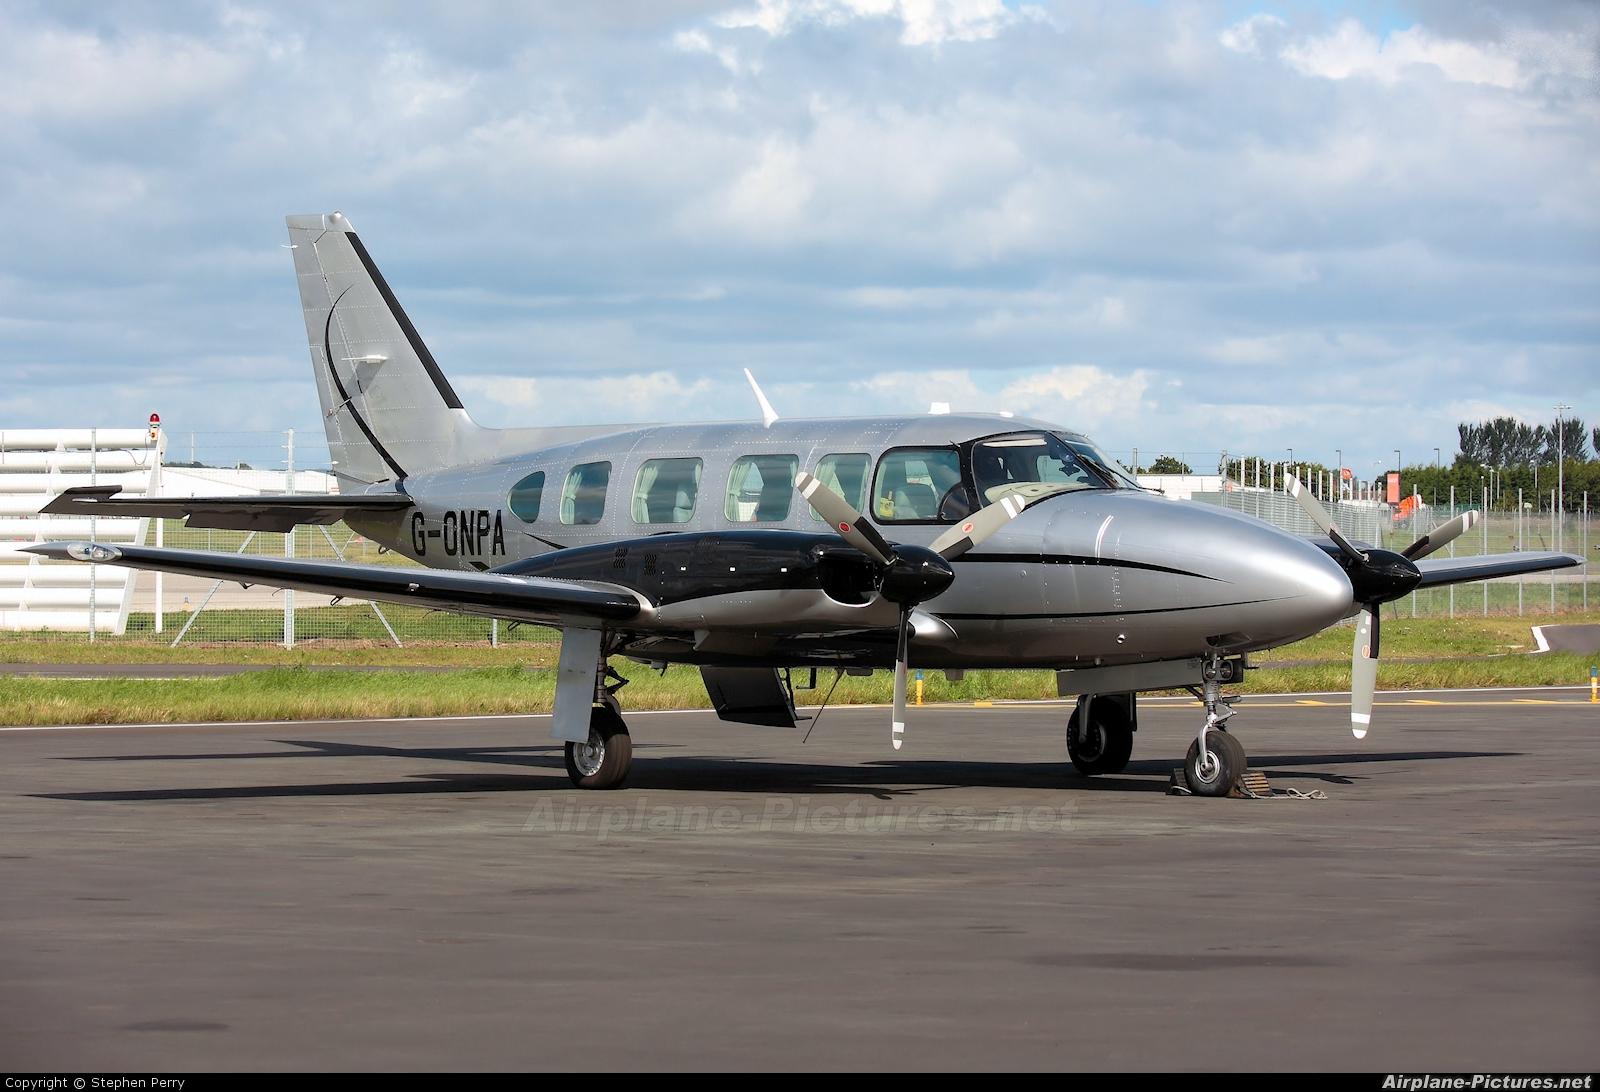 Synergy Aircraft Leasing G-ONPA aircraft at Edinburgh